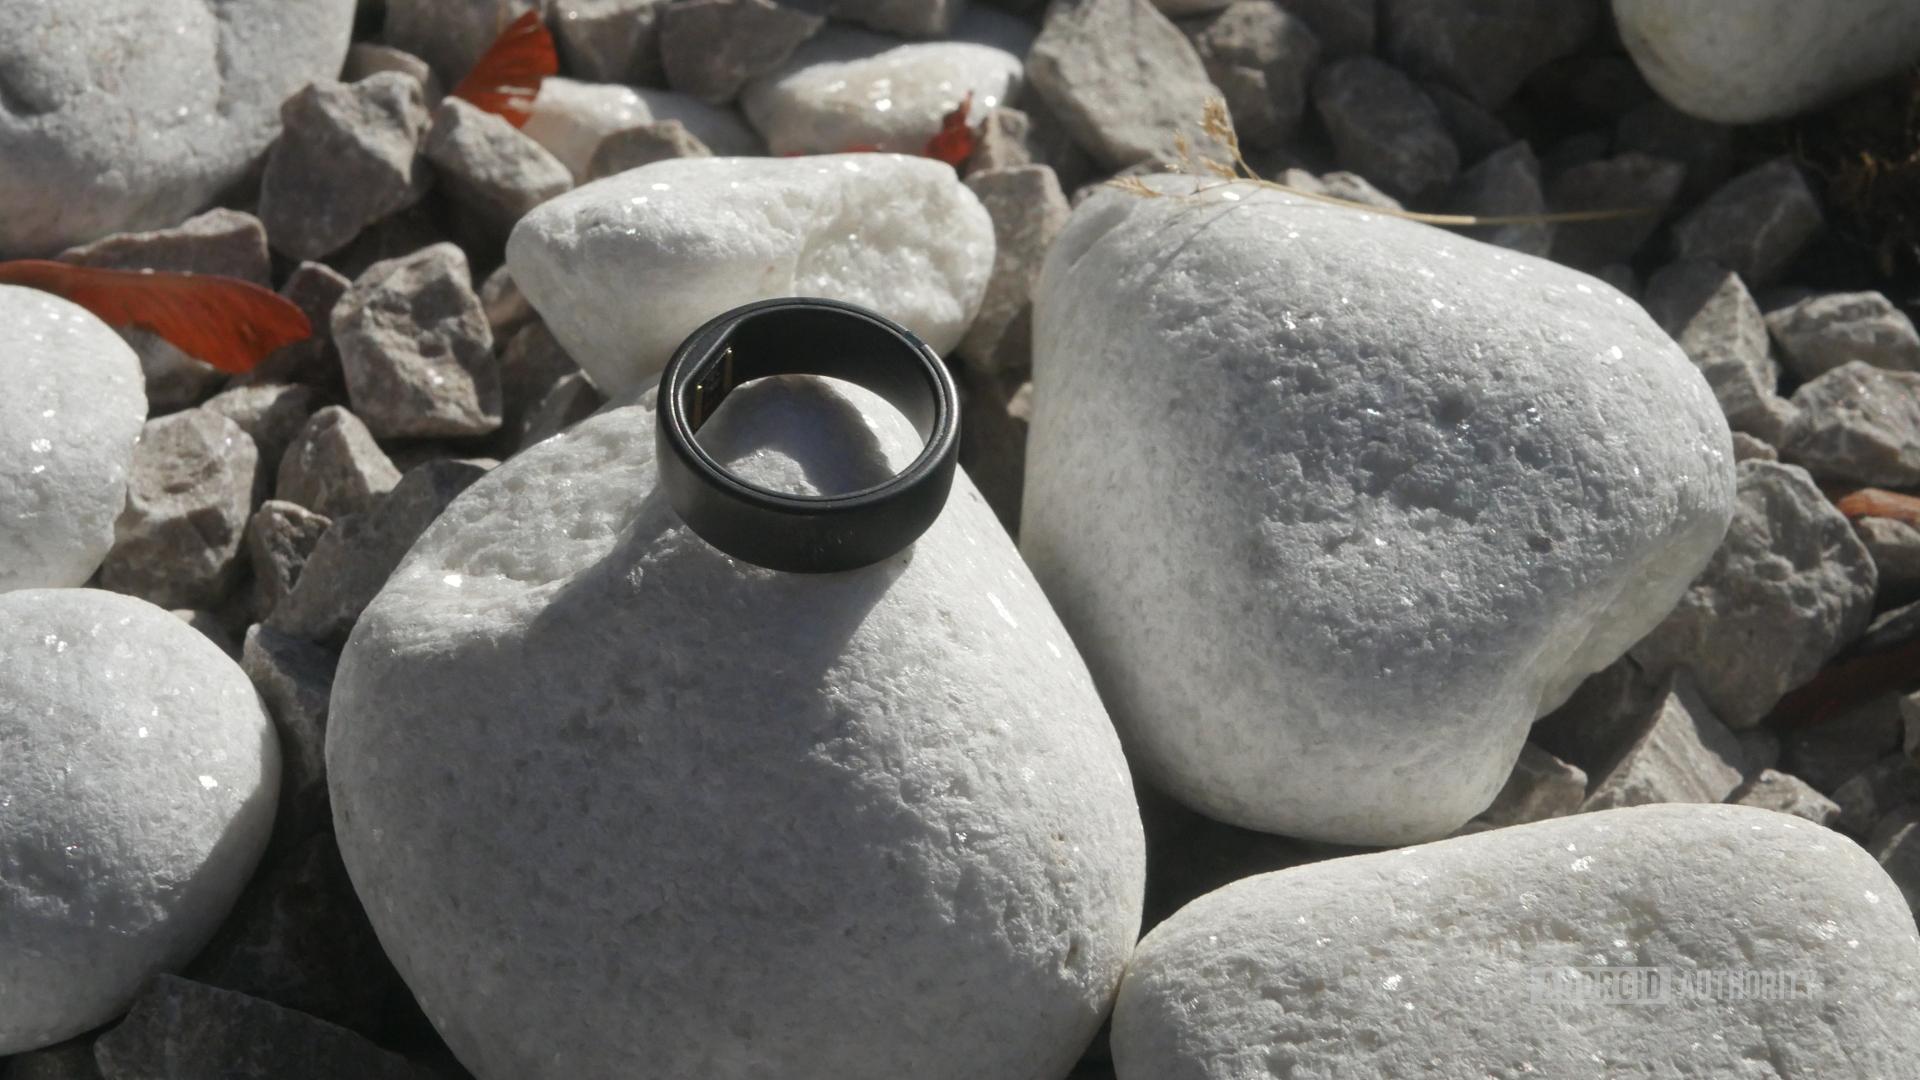 Motiv Ring features, Motiv Ring review